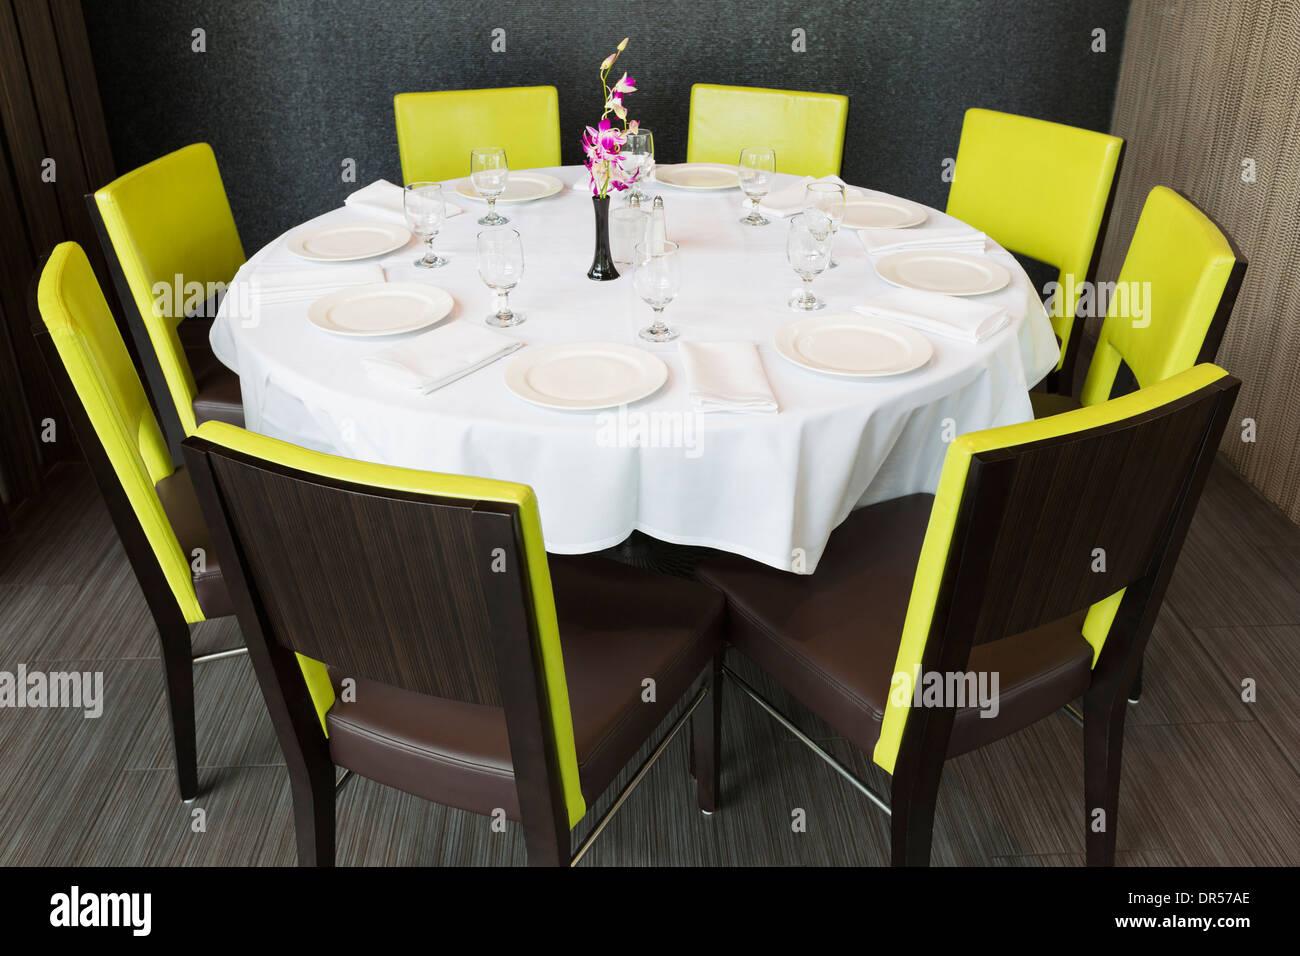 Set table in Thai restaurant - Stock Image